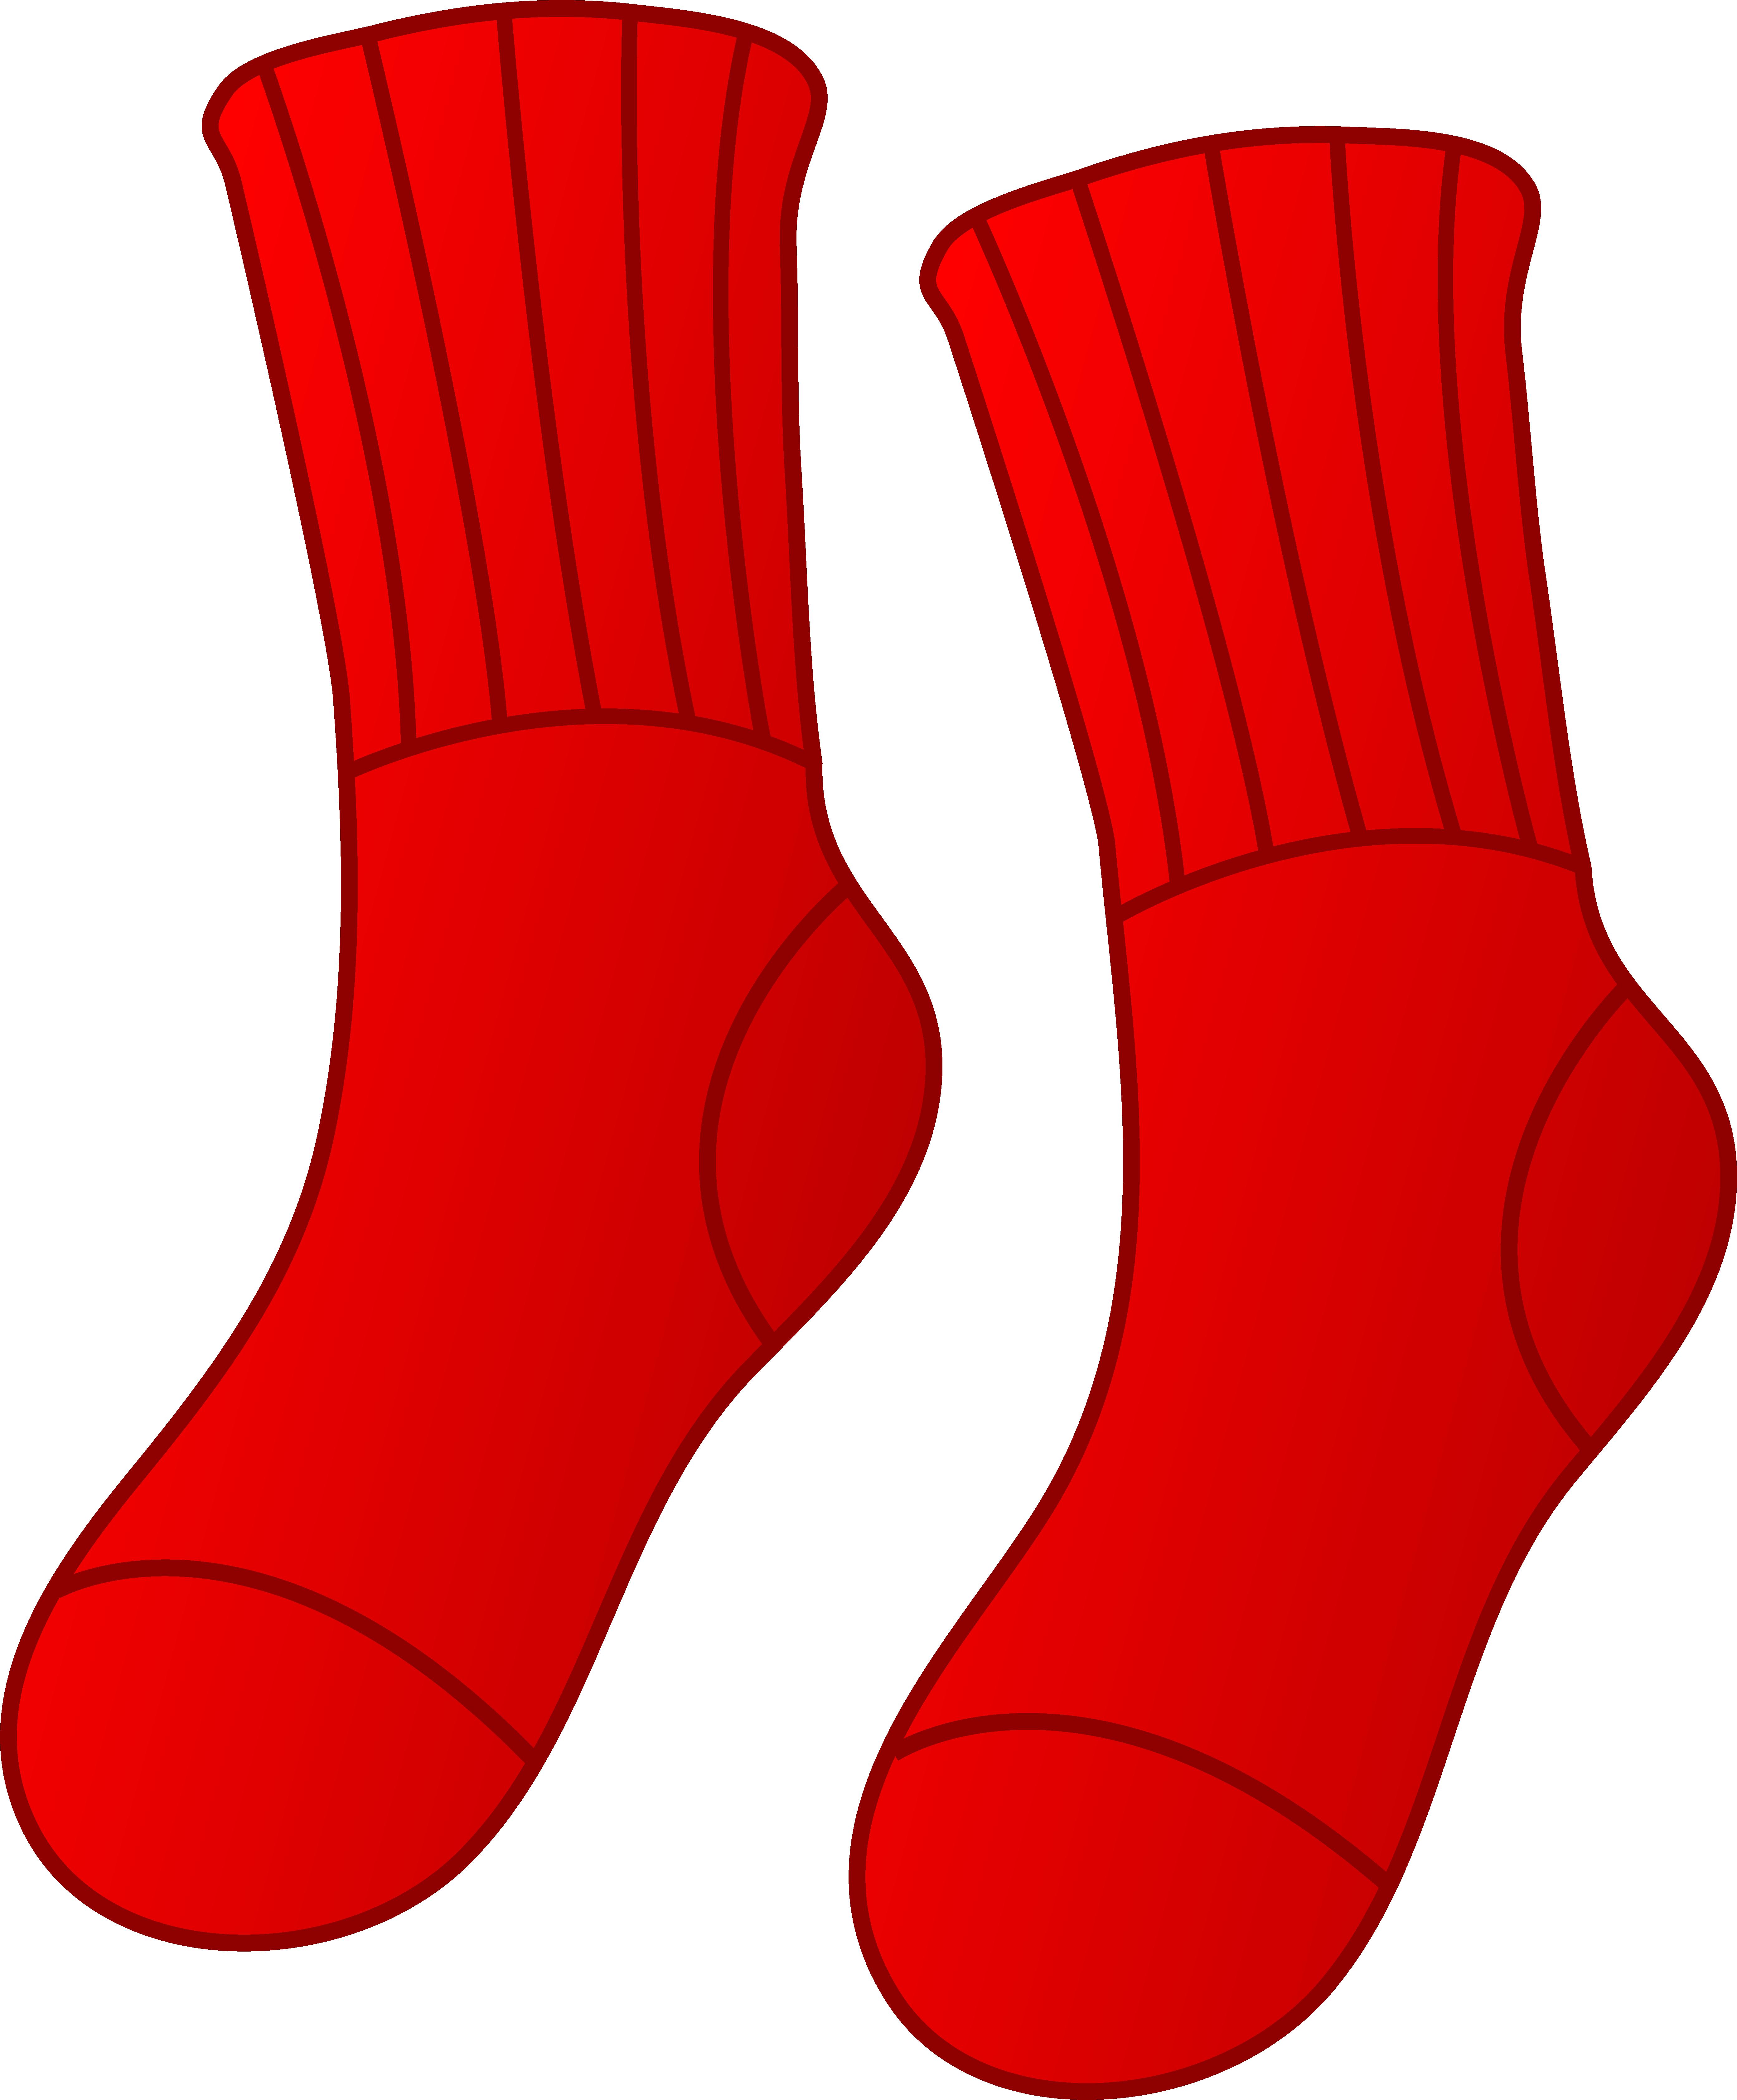 Long socks clipart clip art transparent library Free Socks Cliparts, Download Free Clip Art, Free Clip Art on ... clip art transparent library